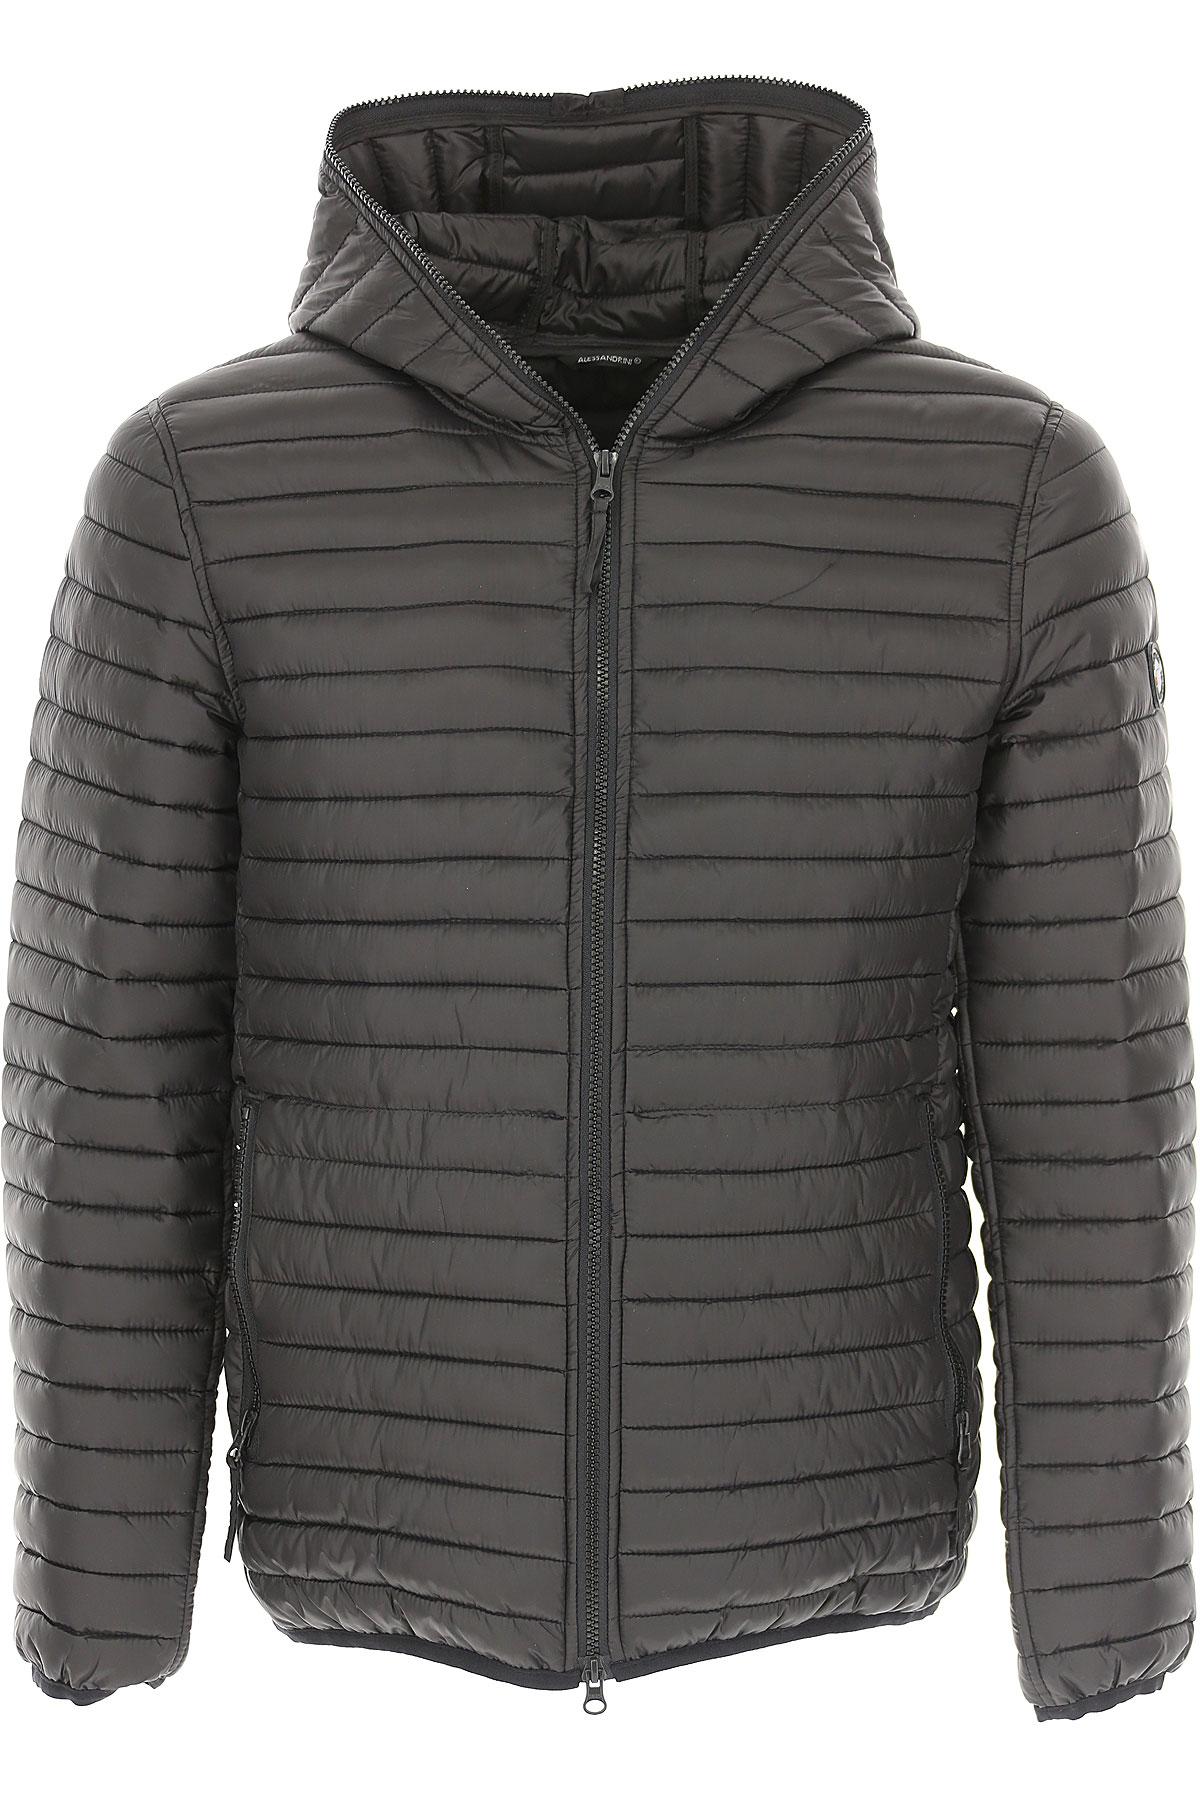 Image of Daniele Alessandrini Jacket for Men, Black, polyester, 2017, L M S